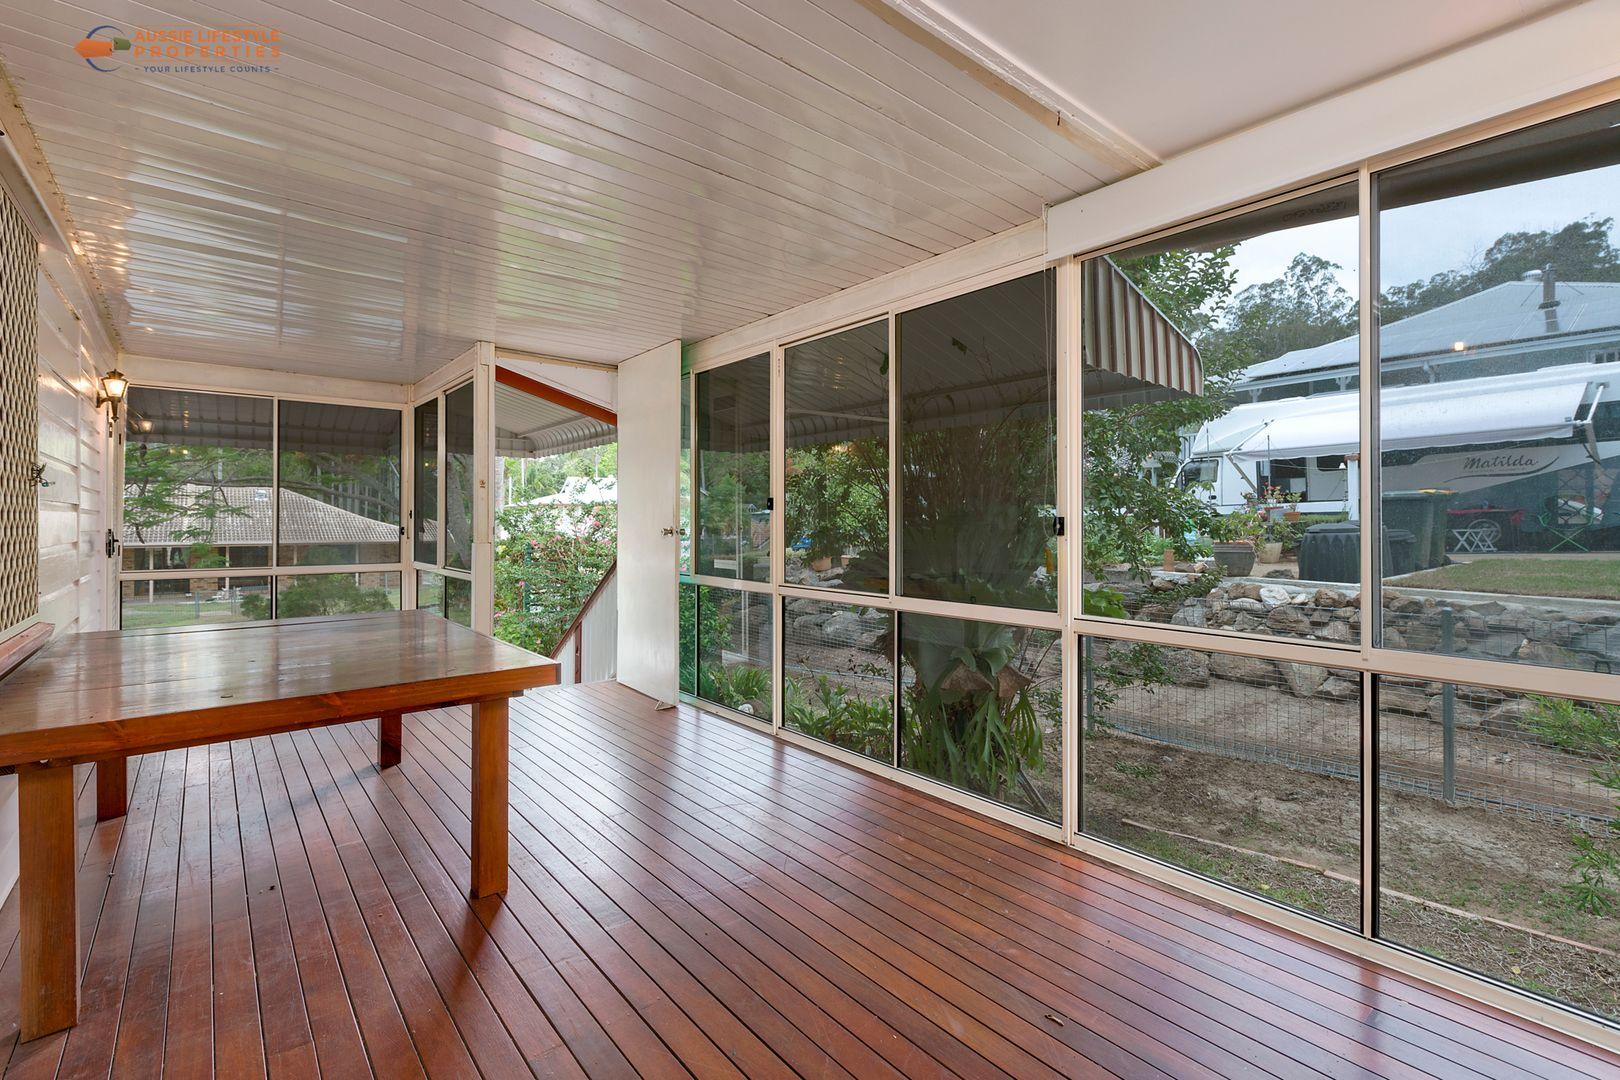 37 Appel Street, Canungra QLD 4275, Image 2